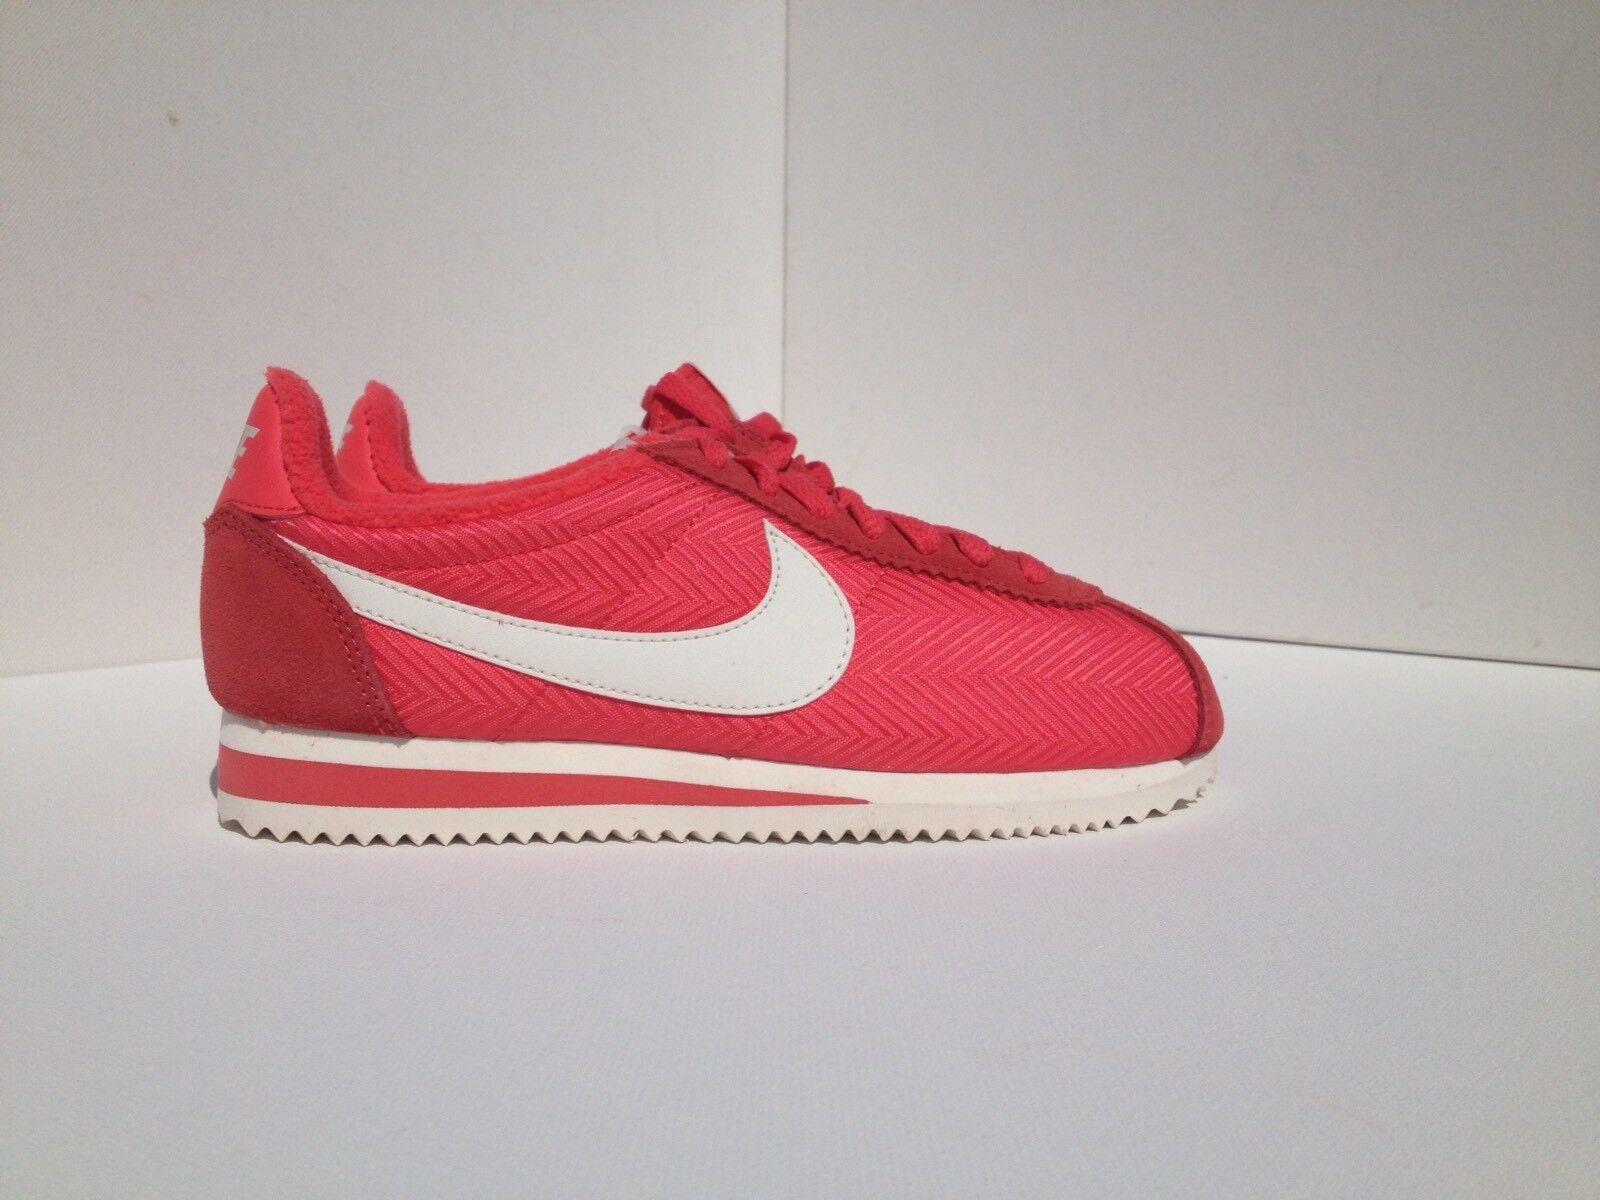 Nike De Mujer Clásico Vela Cortez TXT Ember resplandor Vela Clásico 844892800 d18704